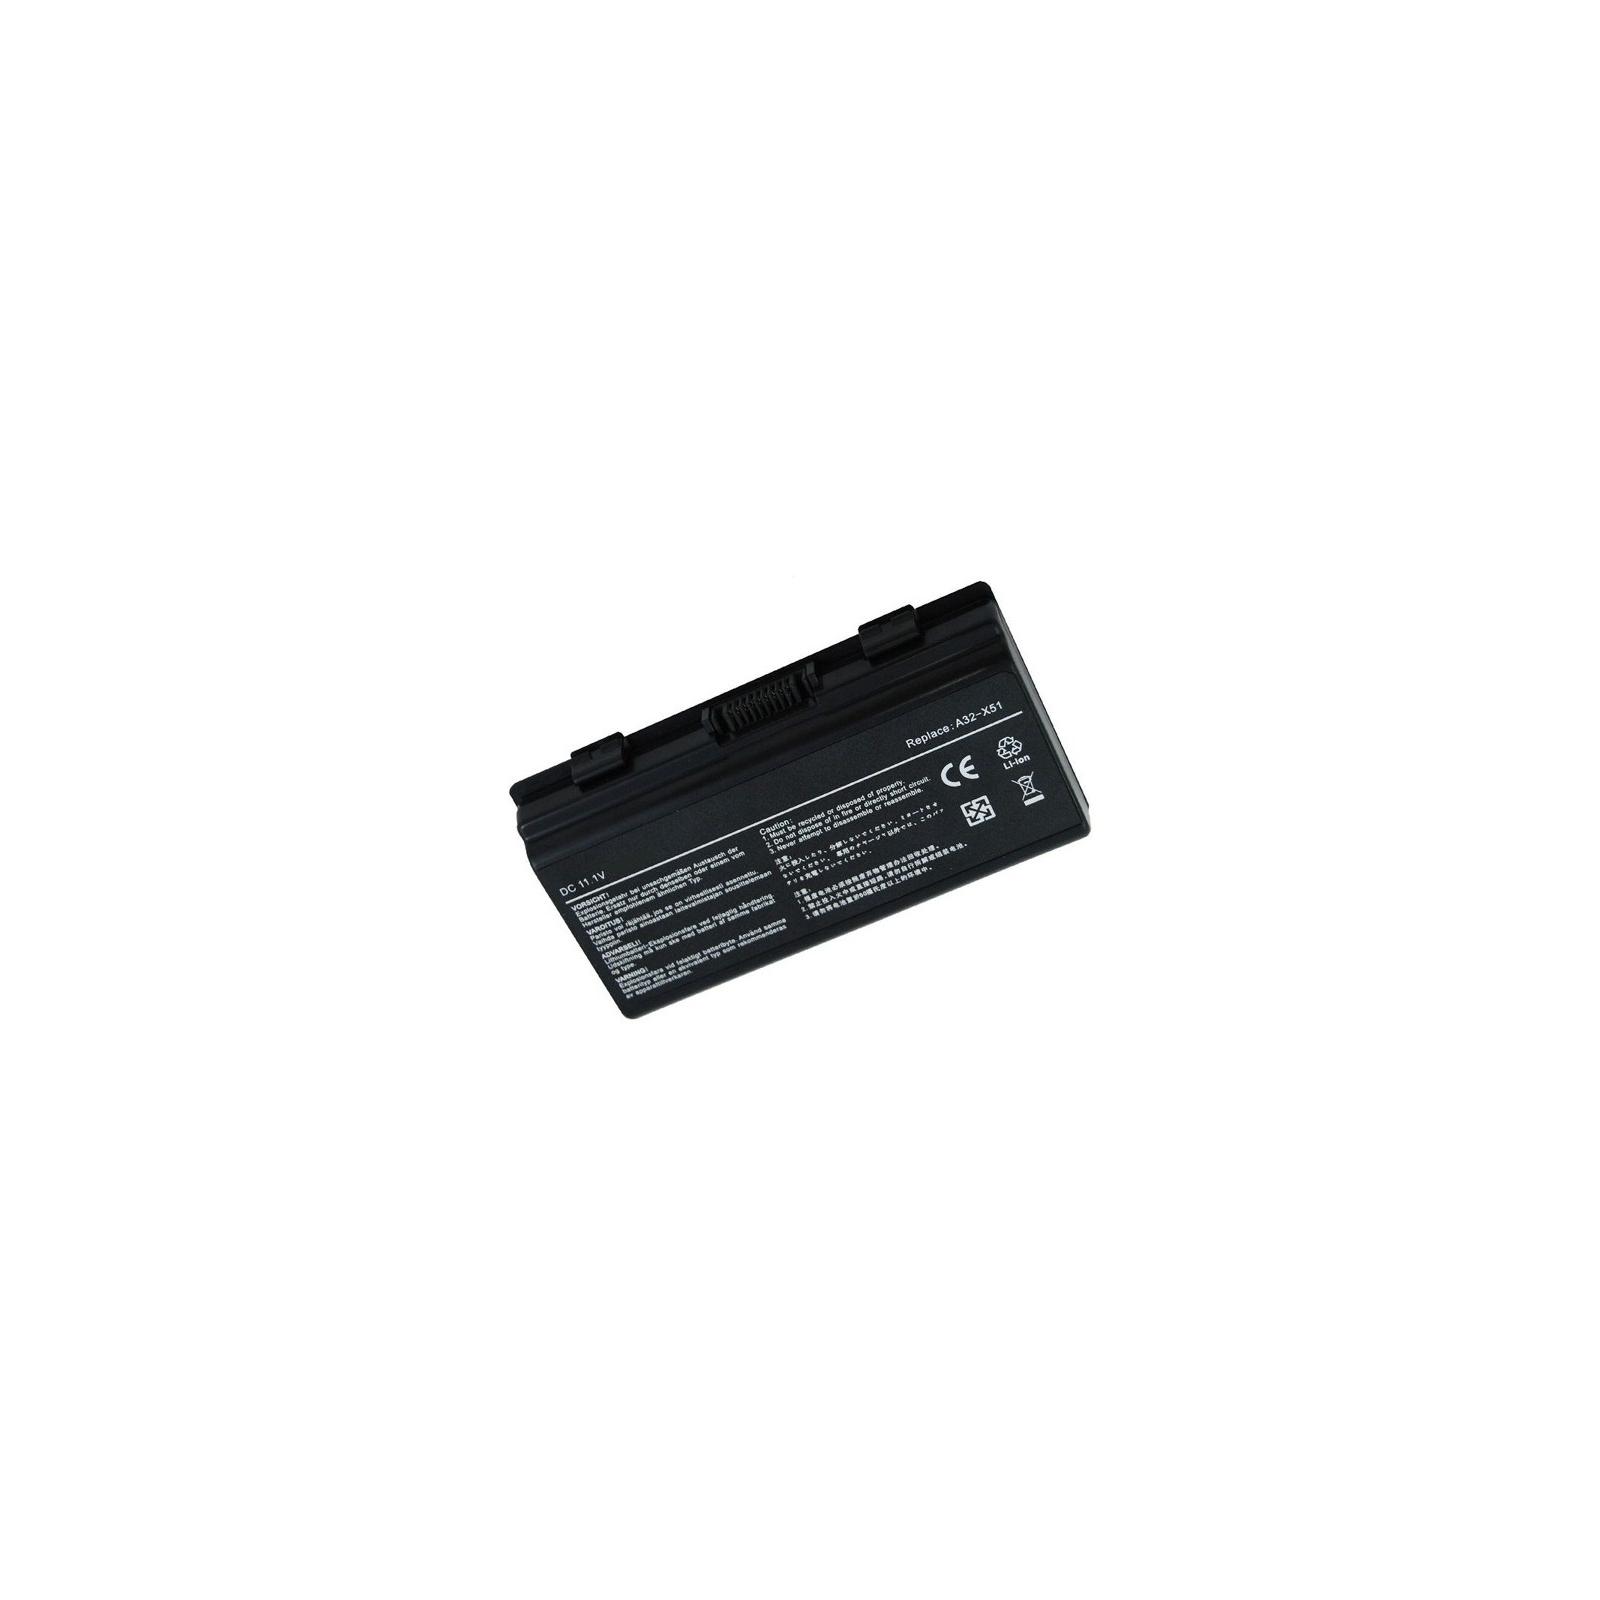 Аккумулятор для ноутбука ASUS X51H (A32-T12, AS5151LH) 11.1V 5200mAh PowerPlant (NB00000011)